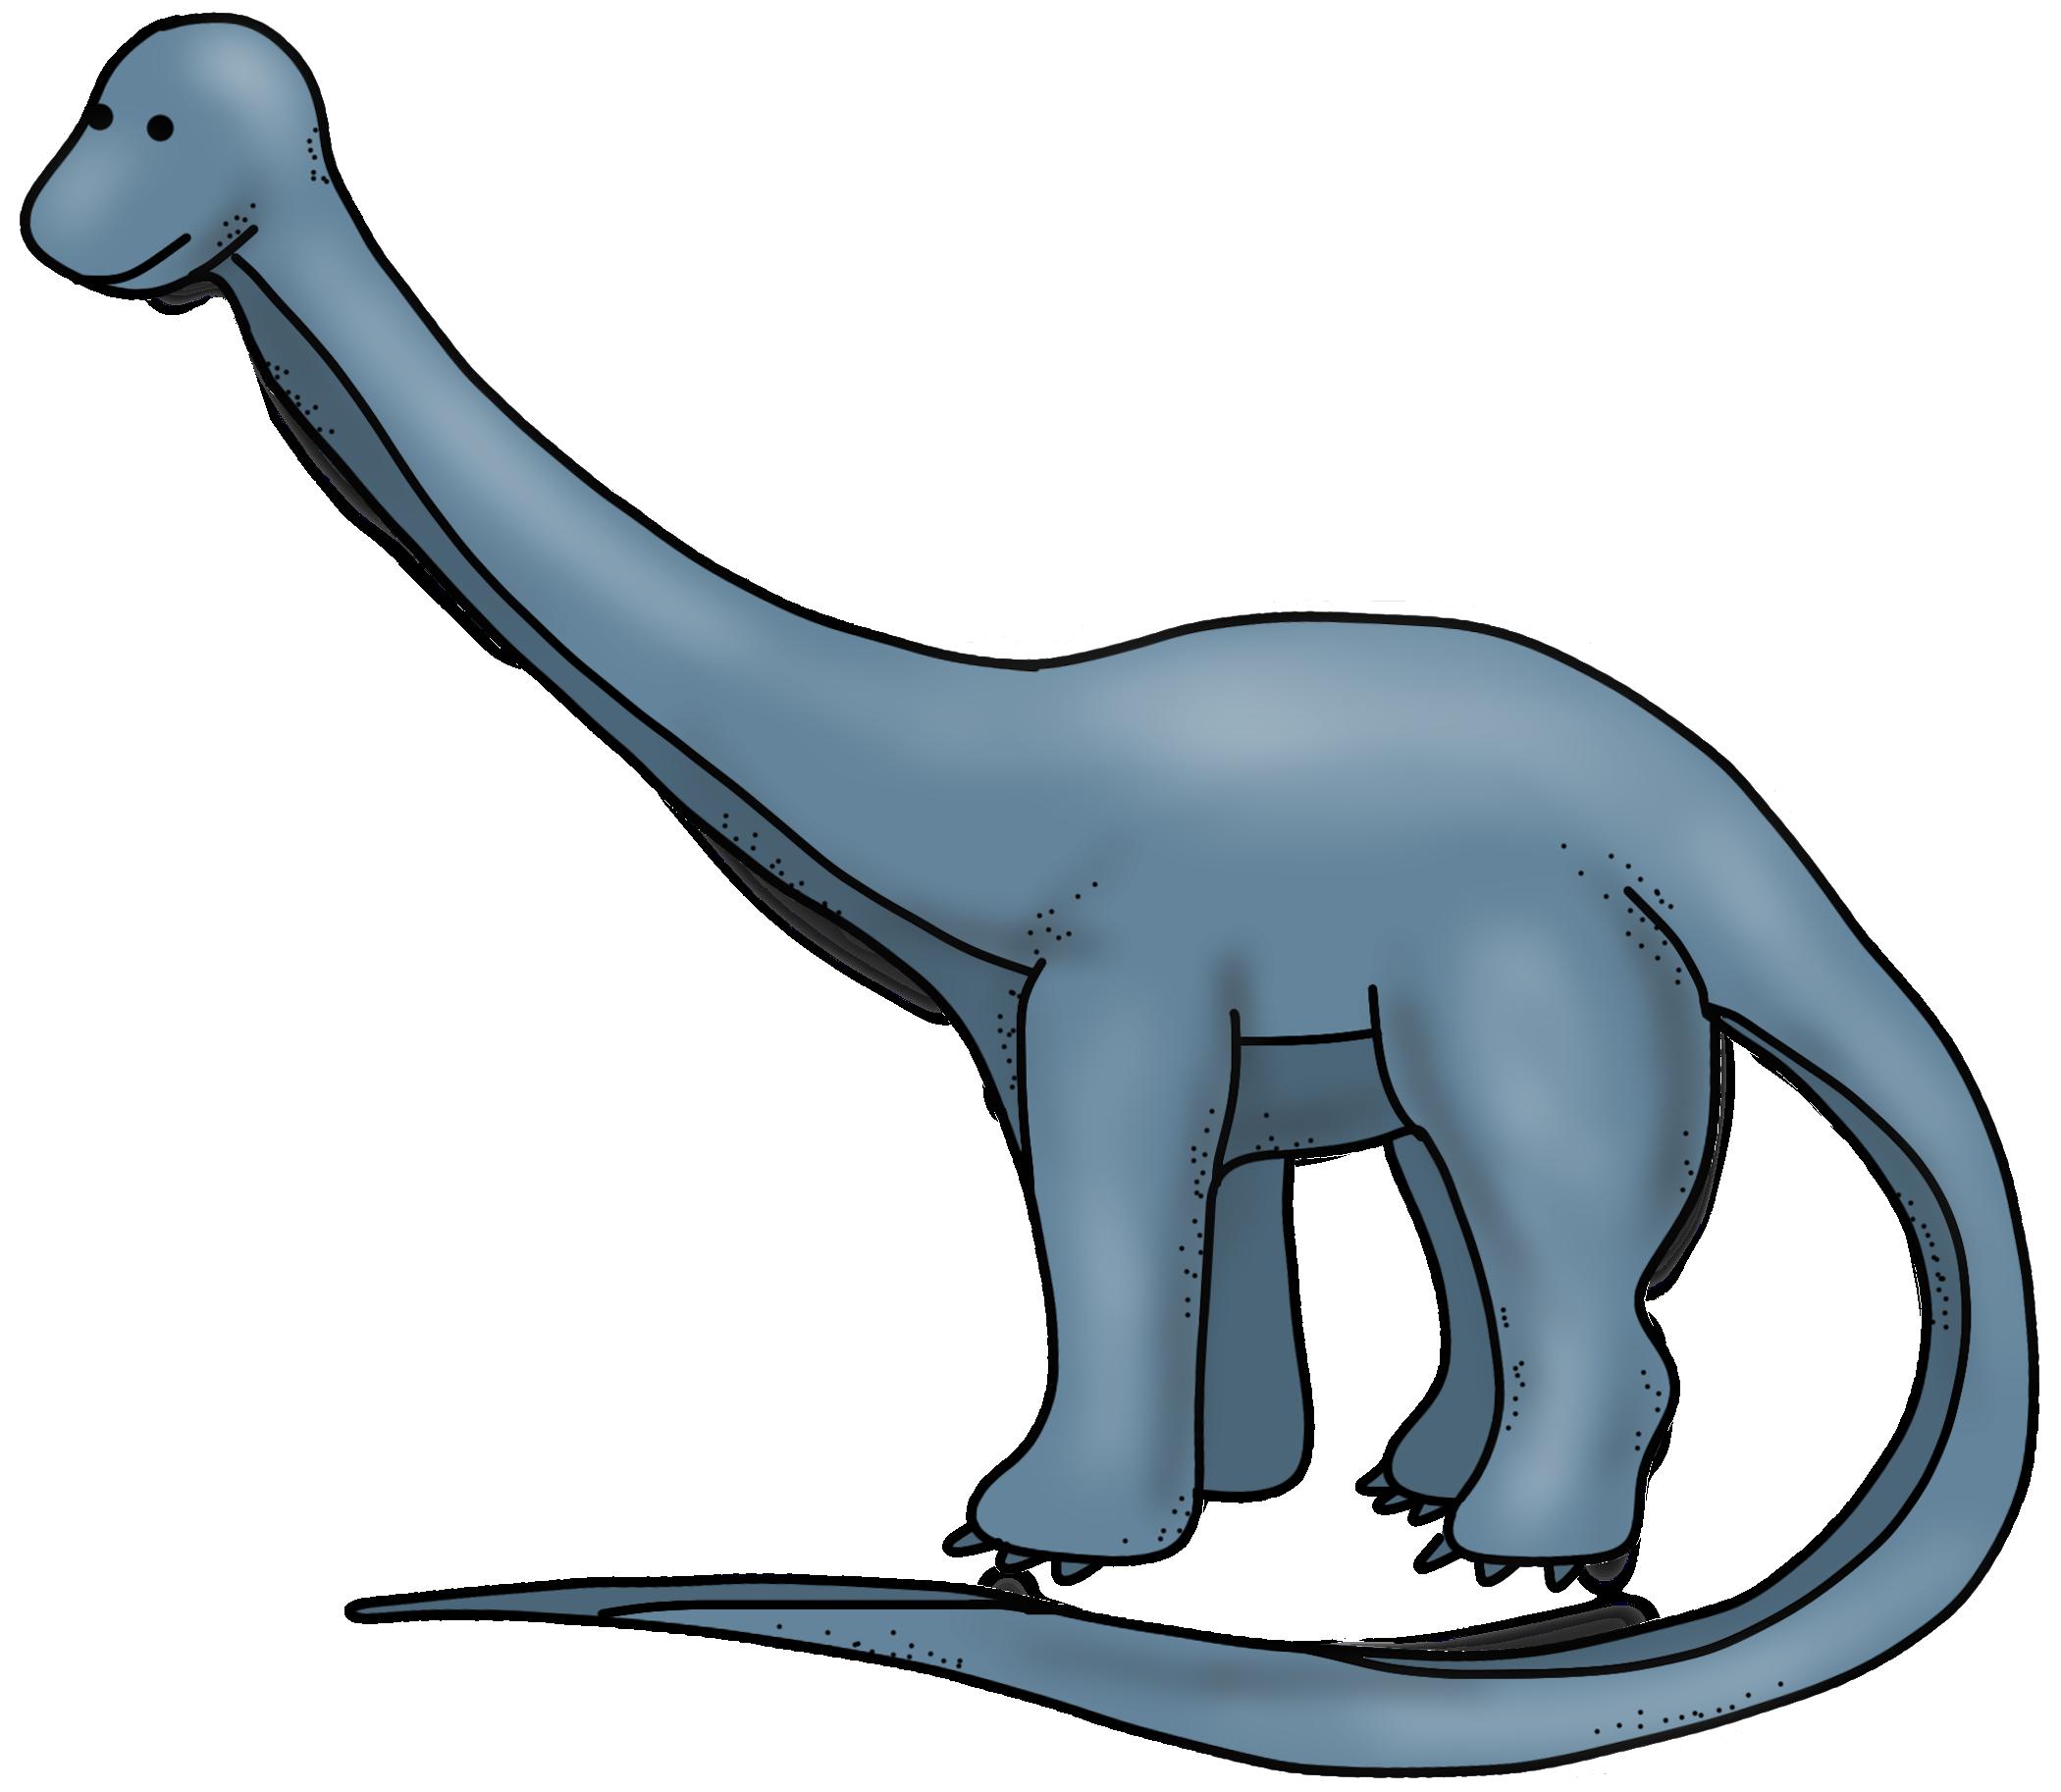 Dinosaurs clipart apatosaurus. Dinosaur discoveries of grafton